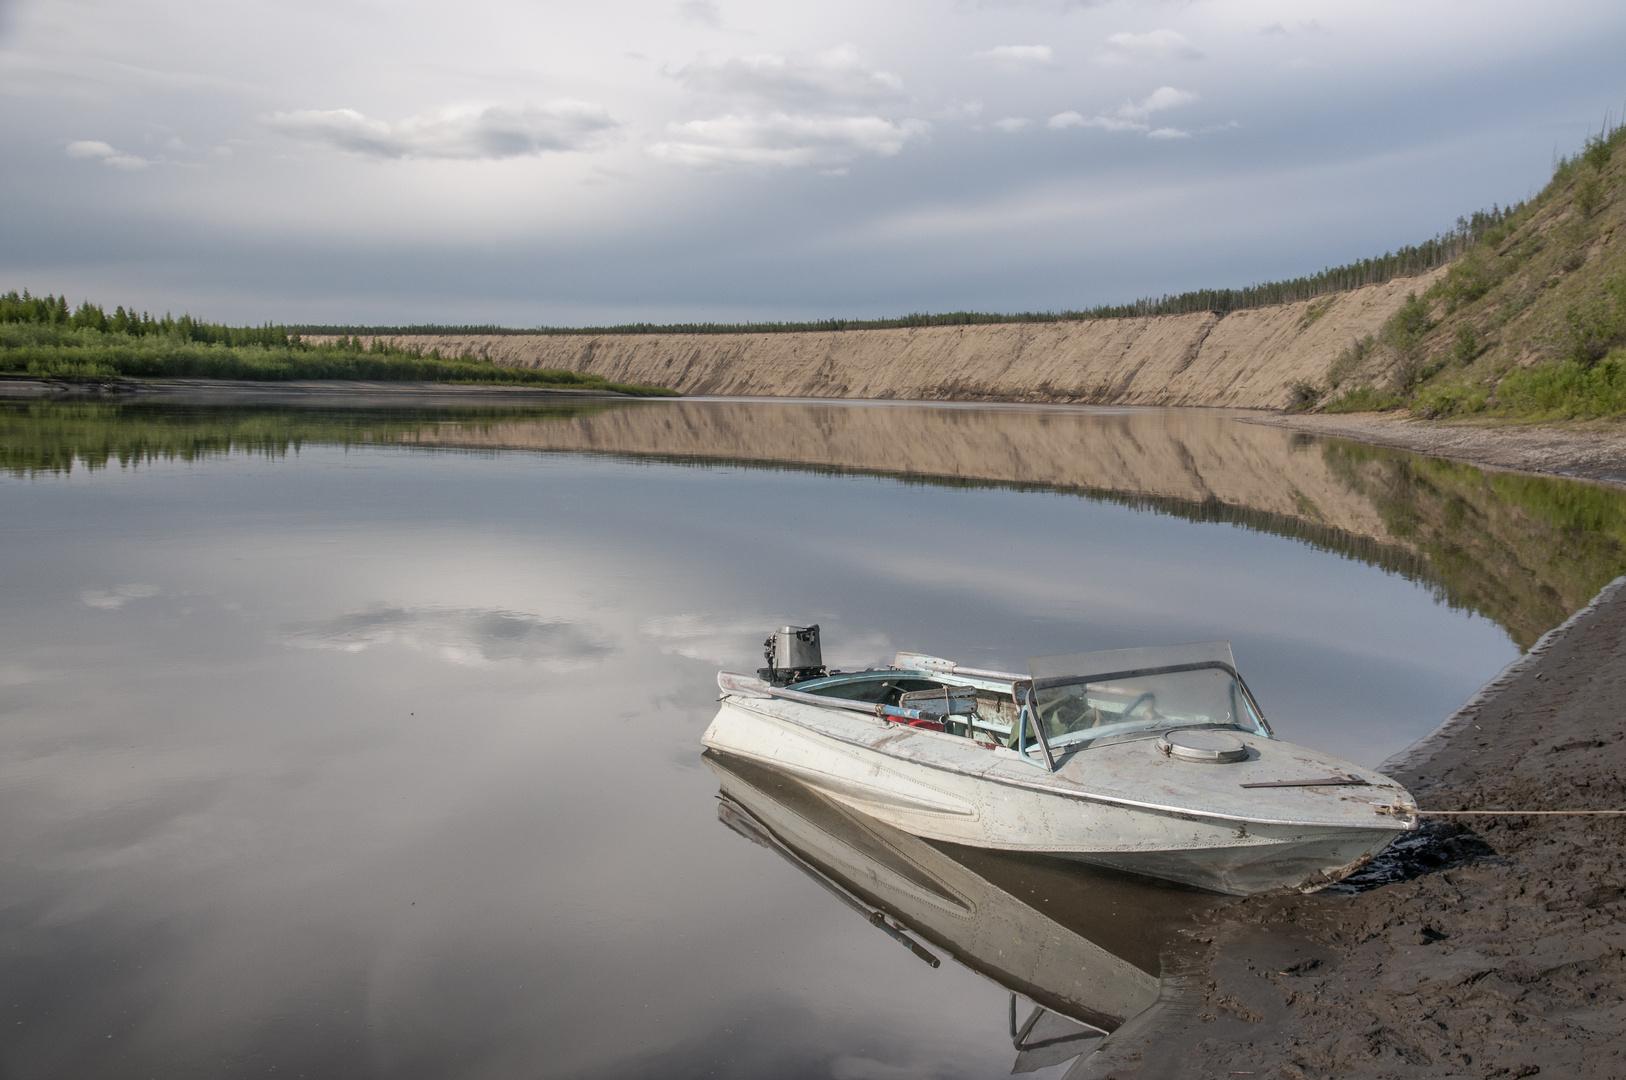 Adycha River, Siberia